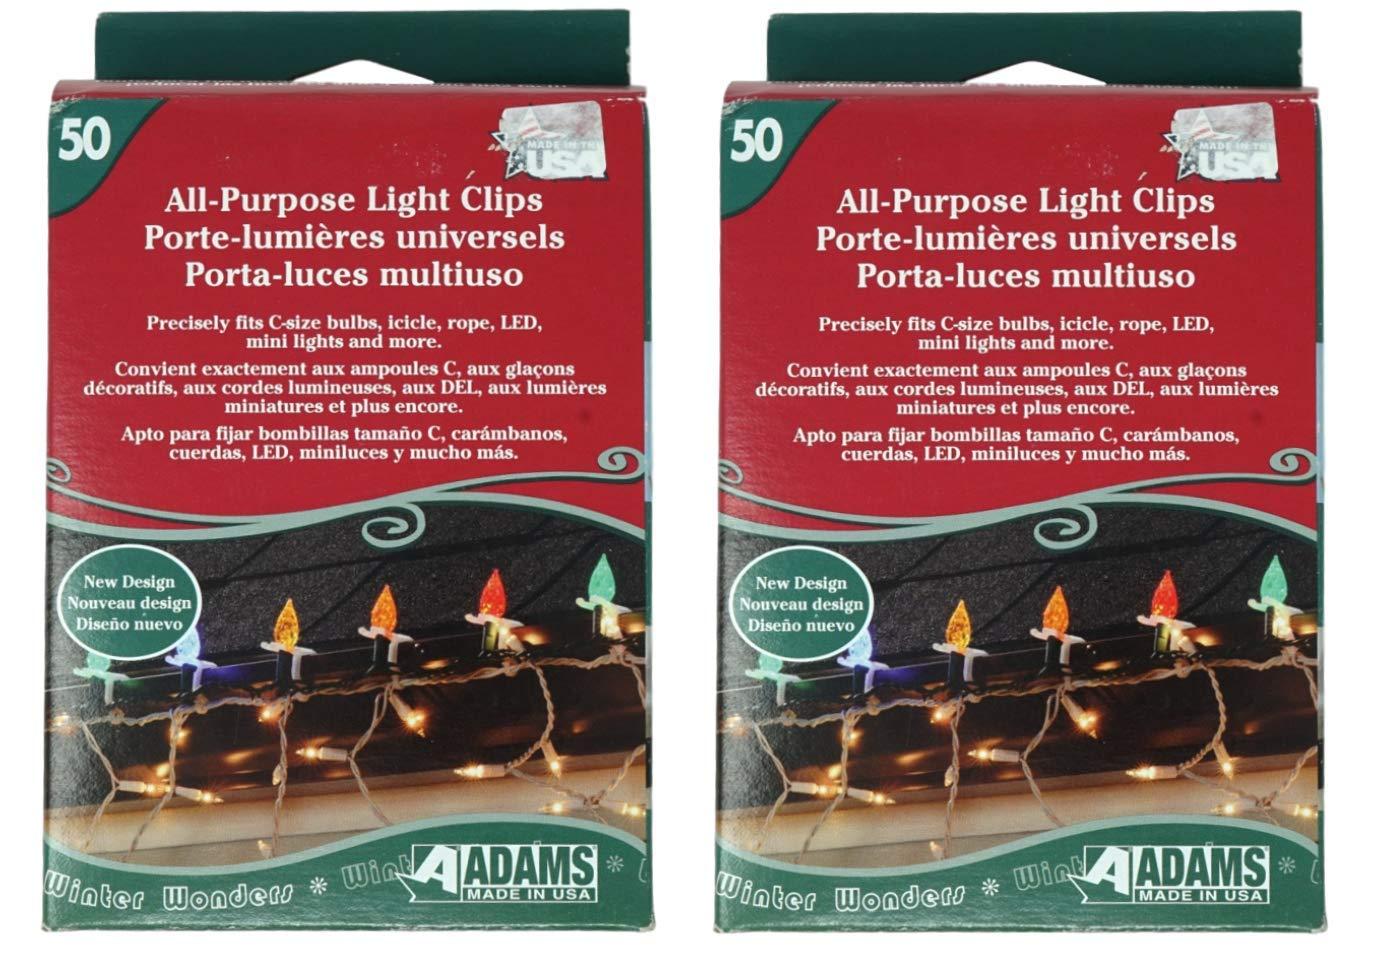 Amazon.com : Adams USA Light Clips for Outdoor String Lights, Strip Lights, Christmas Lights, and Home Decor Led Lights, 100 Clips : Garden & Outdoor